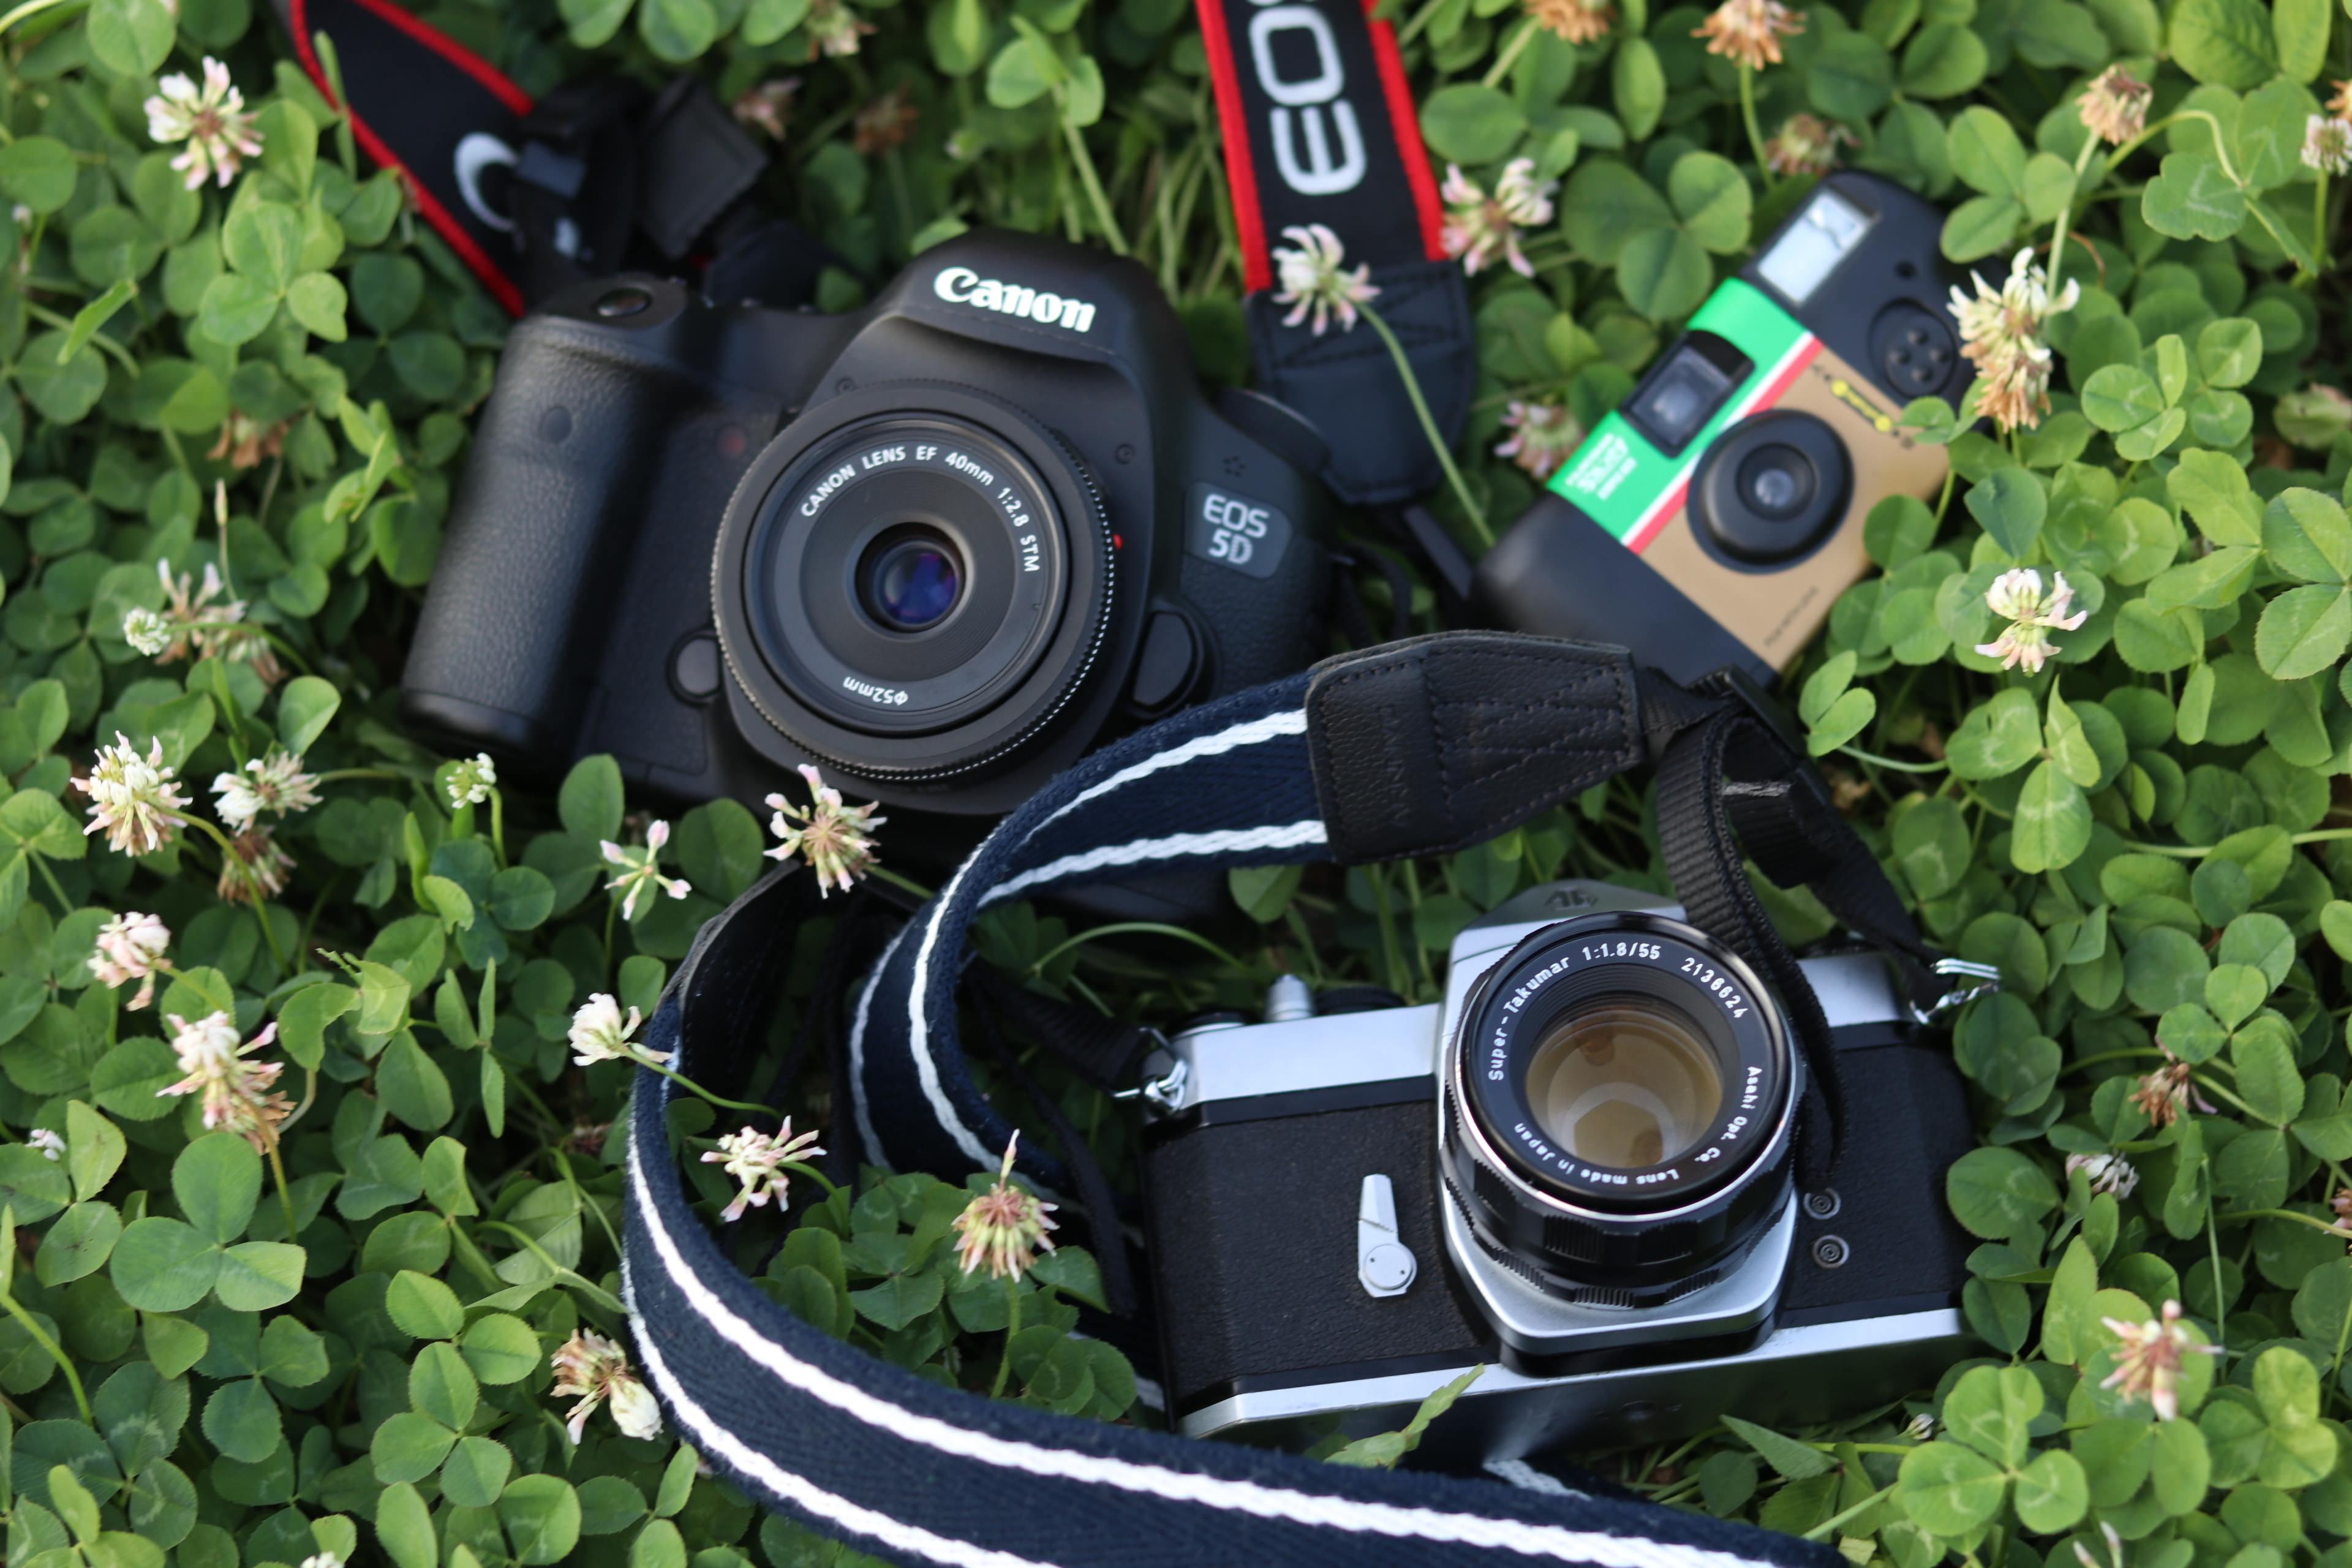 Приклад для цифрового фотоаппарата мастера наносят